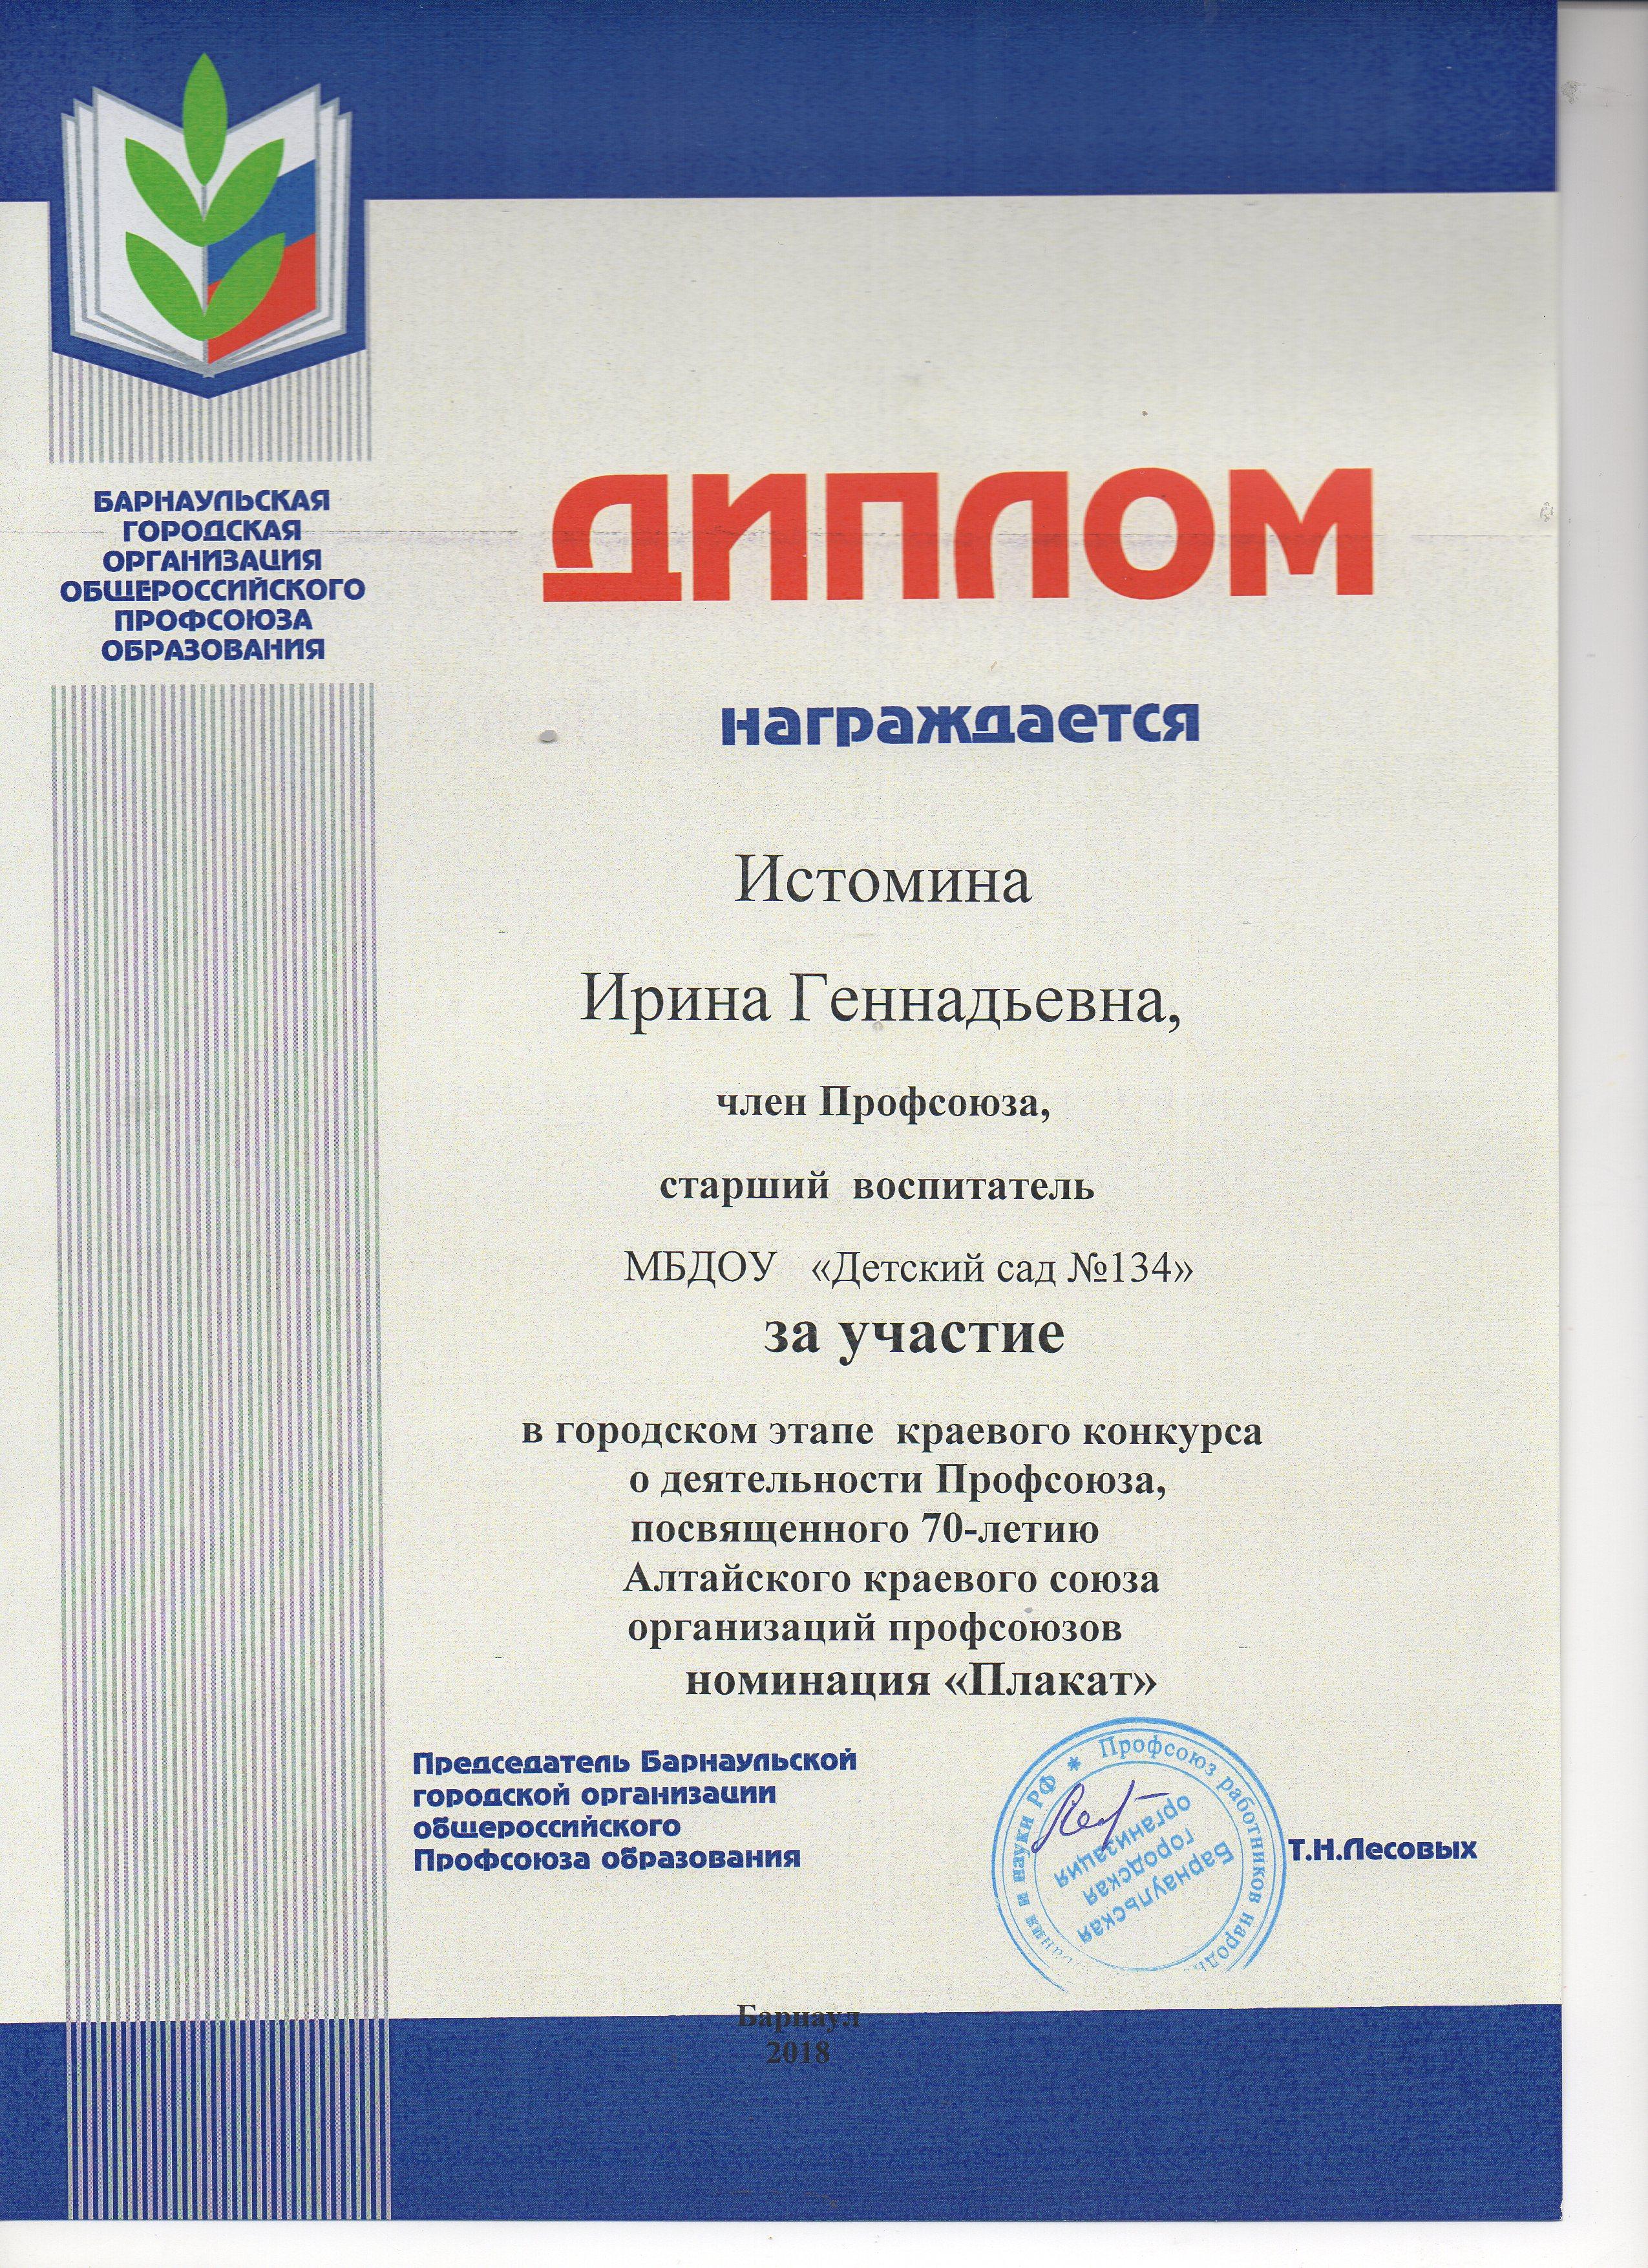 img753